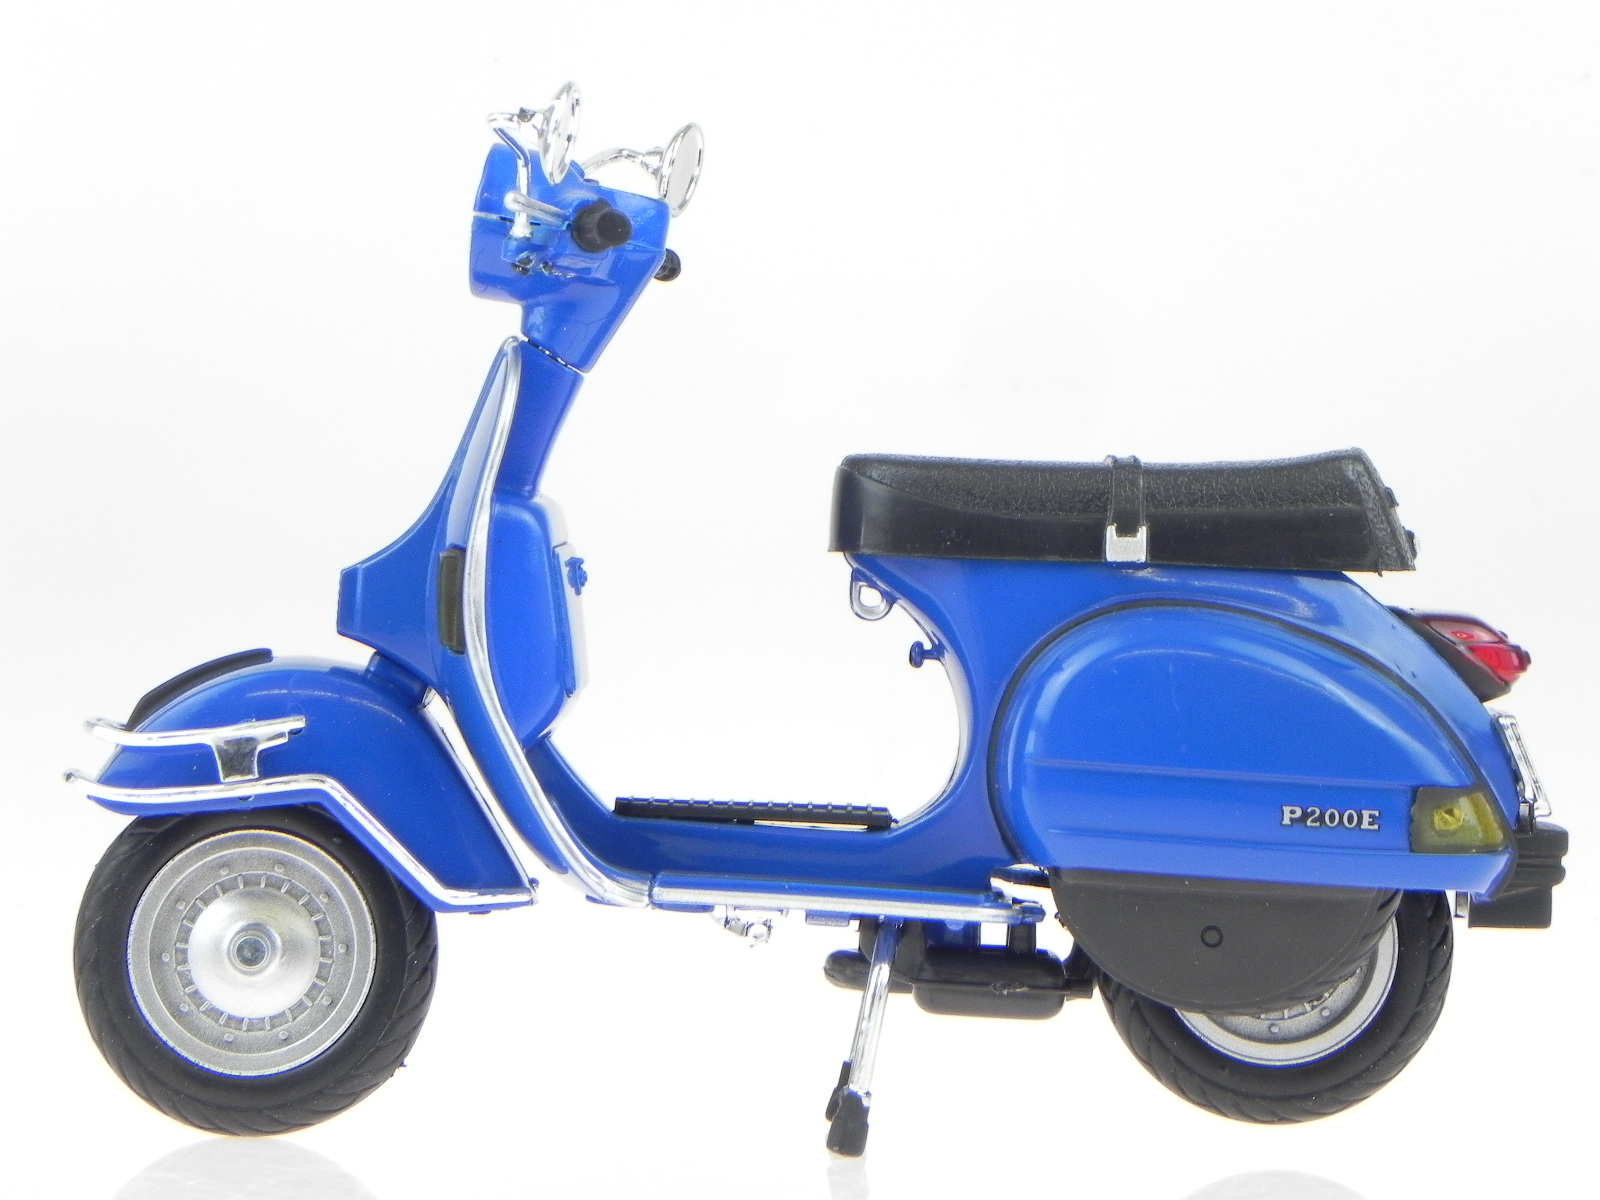 vespa p 200 e px 1978 blue uni metall modell 42123 newray 1 12 4058124220572 ebay. Black Bedroom Furniture Sets. Home Design Ideas